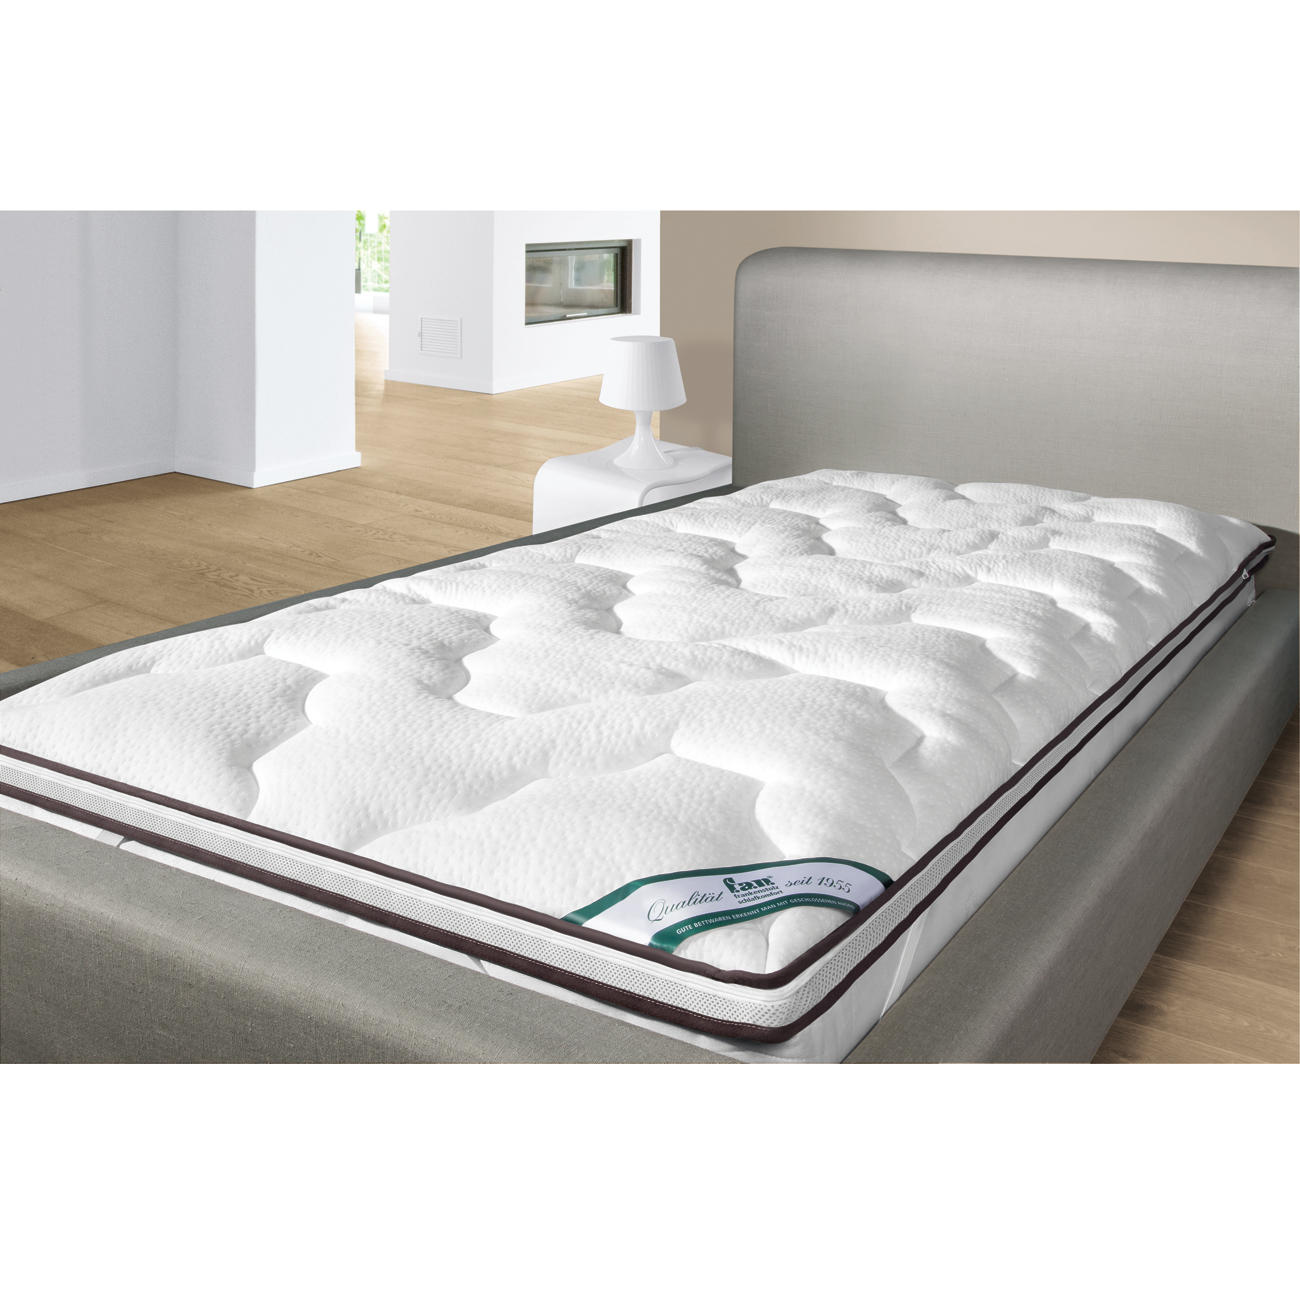 f a n topper taschenfederkern punktoflex softly 90 x 190 cm g. Black Bedroom Furniture Sets. Home Design Ideas